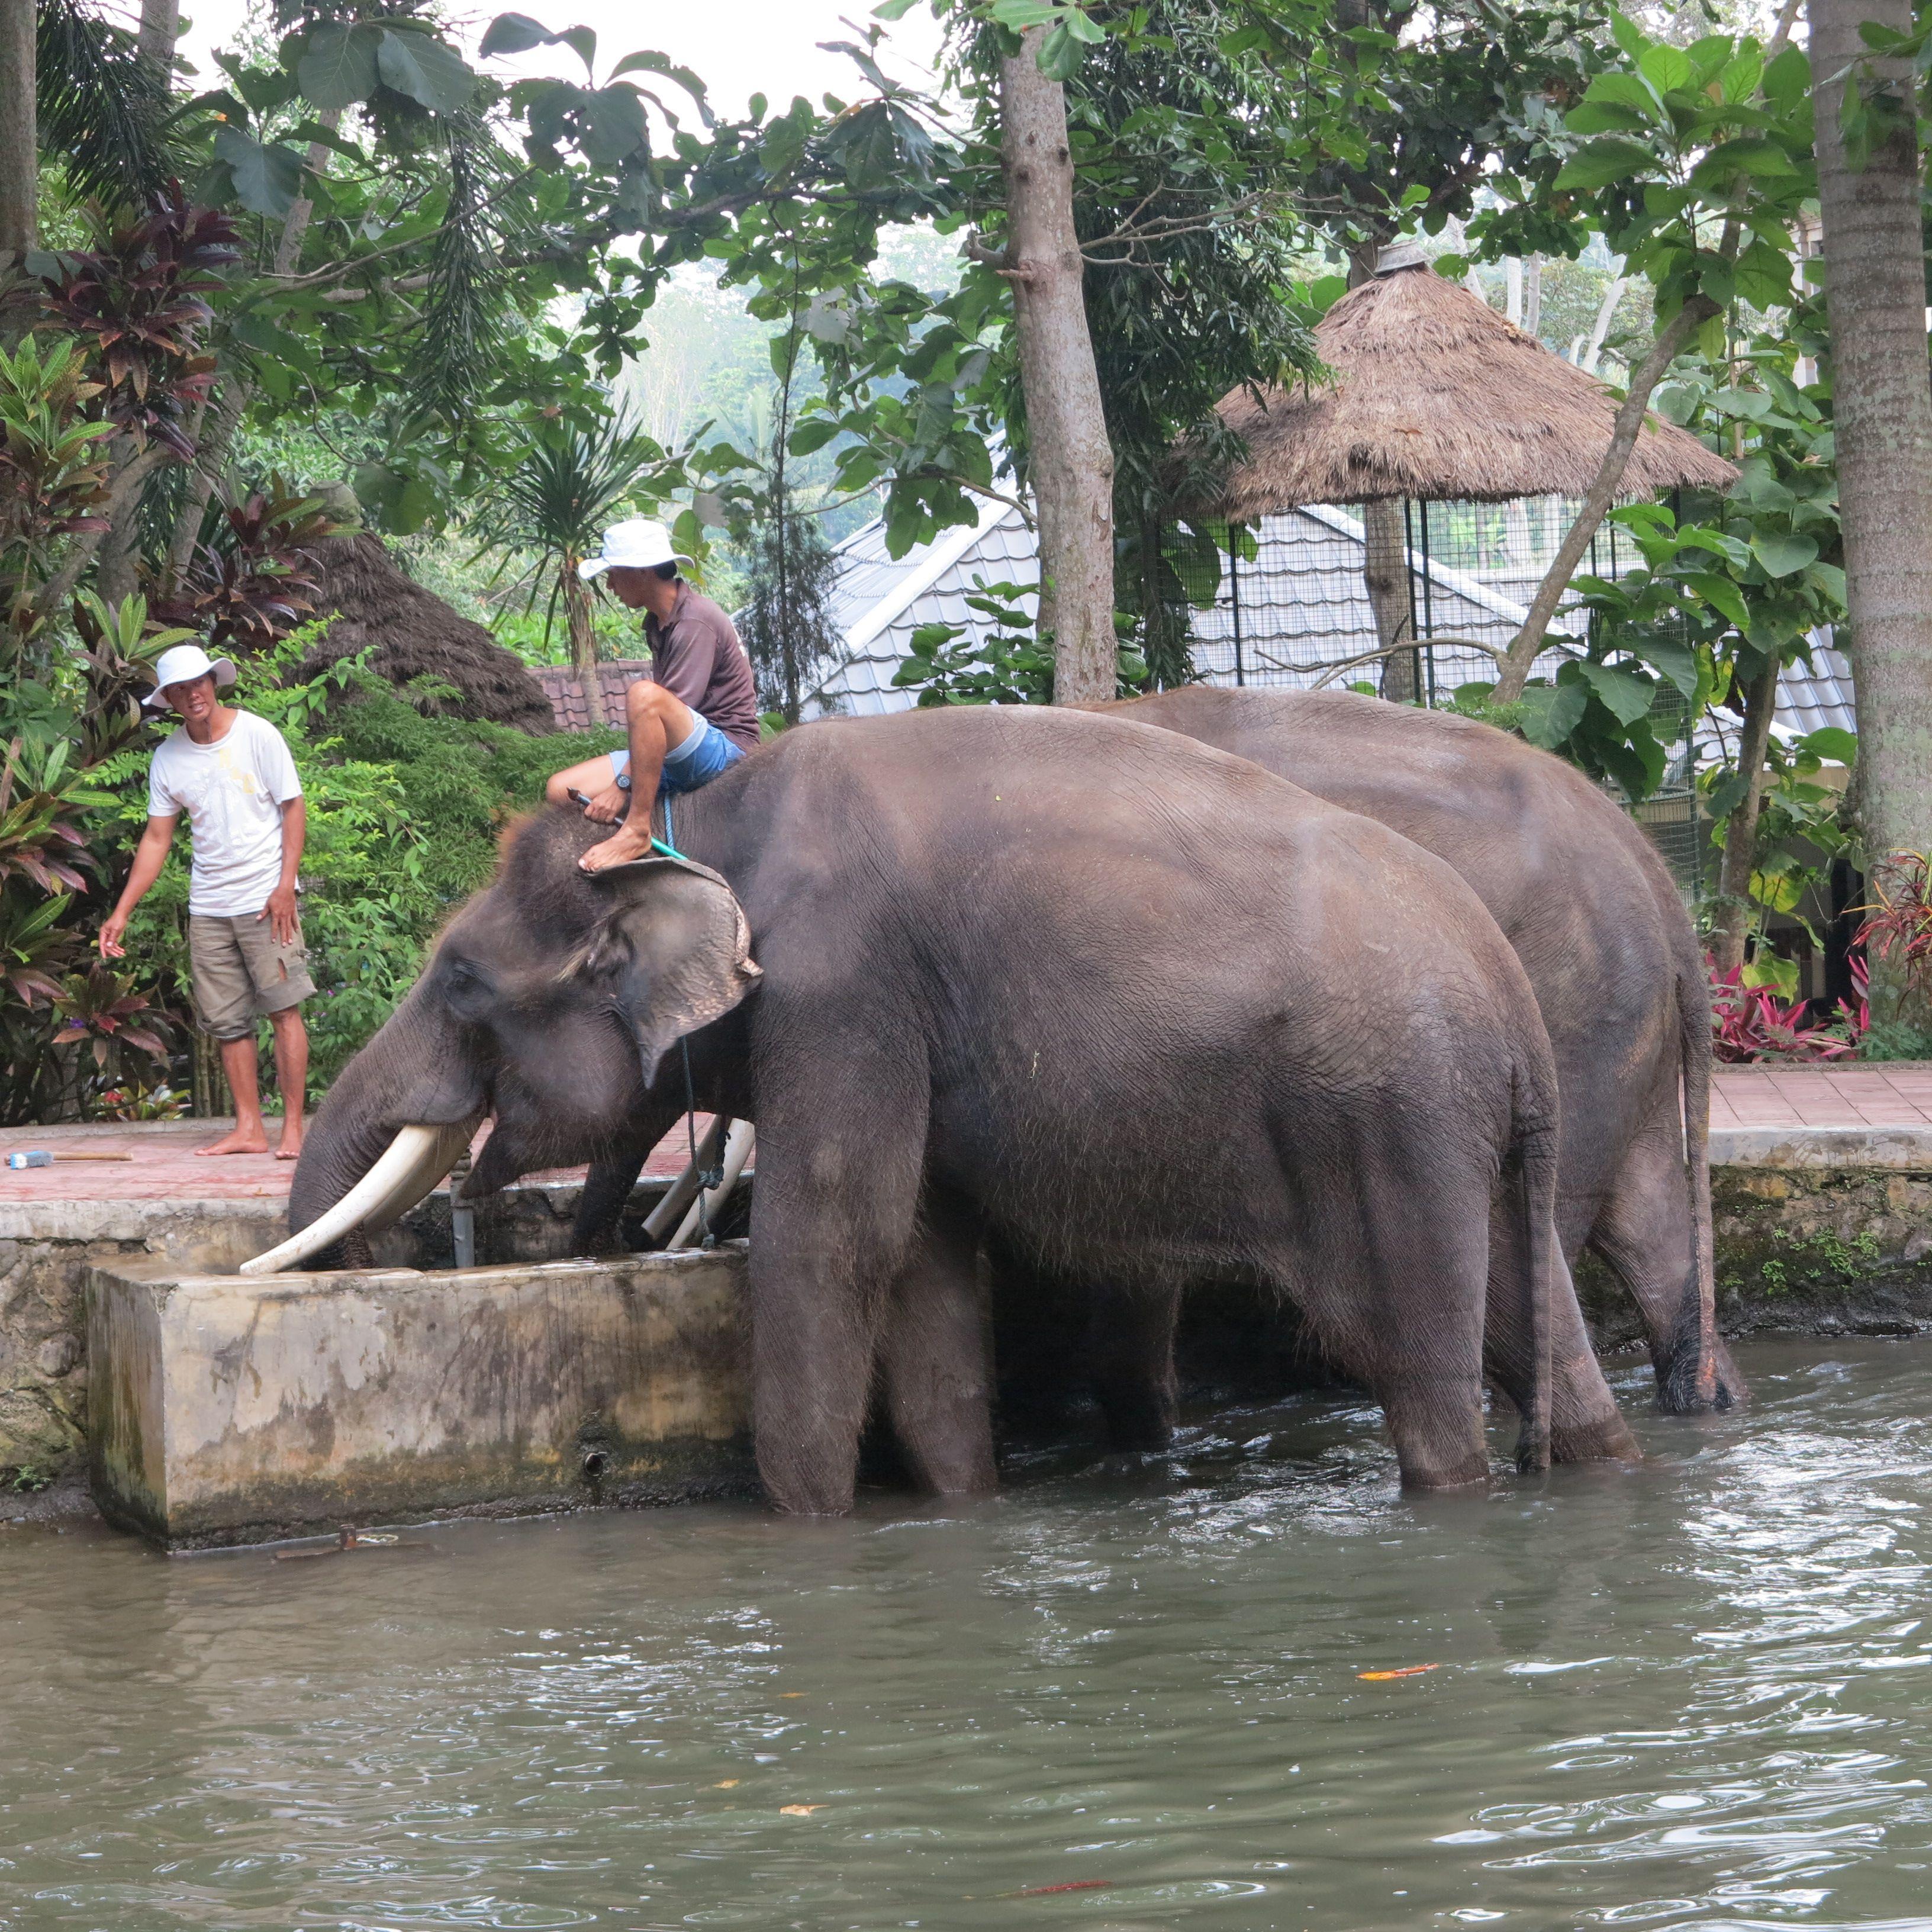 Die Besten Hotels In Bali